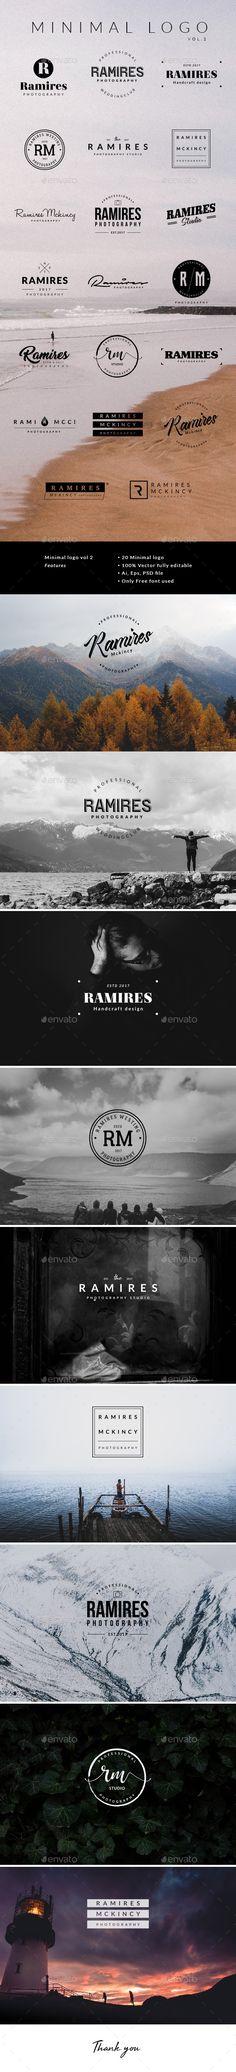 Minimal Logo Vol.2 — Photoshop PSD #Logo Kit #Luxury Simple • Available here ➝ https://graphicriver.net/item/minimal-logo-vol2/20876049?ref=pxcr